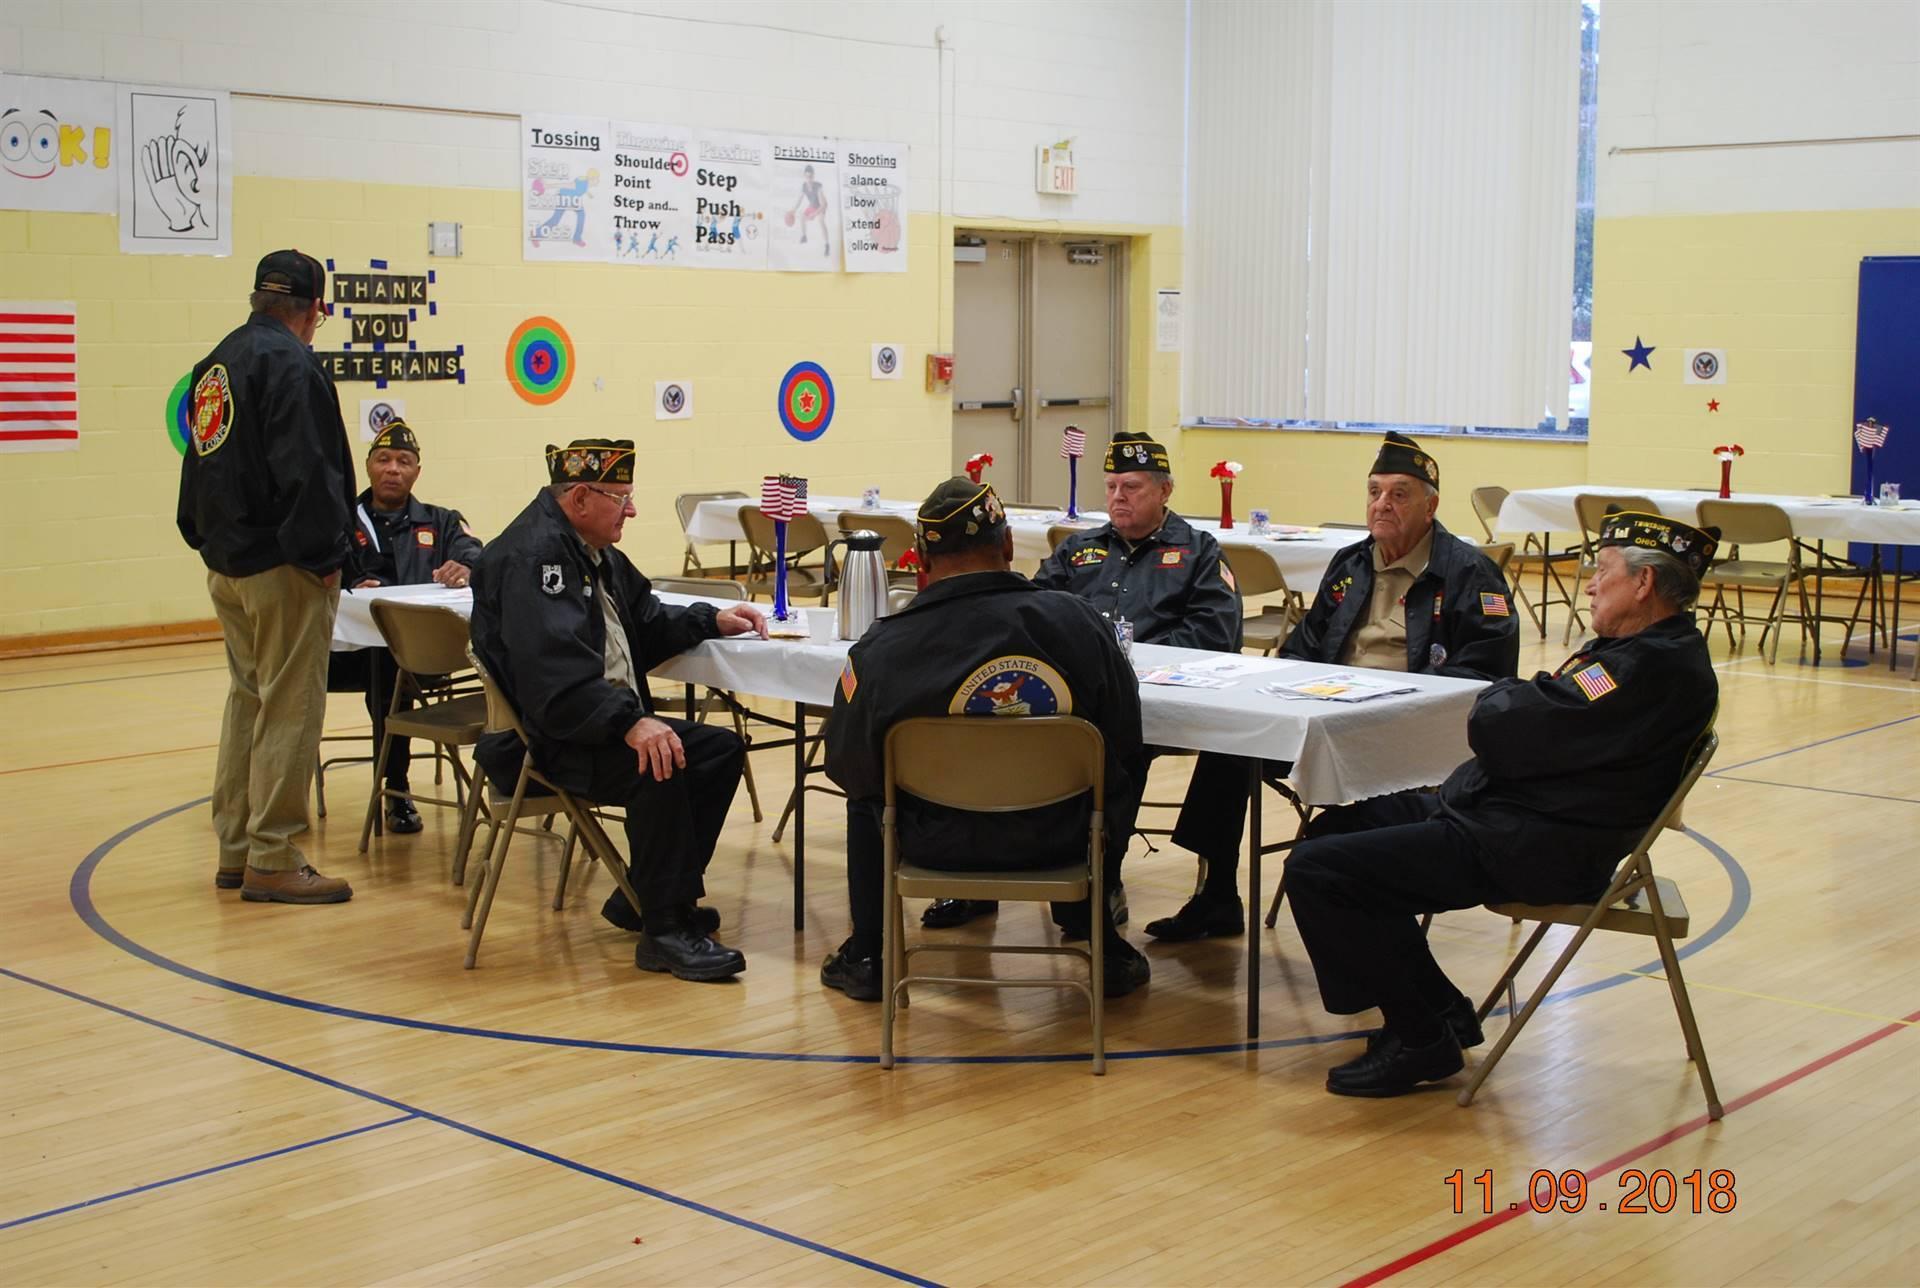 Military veterans enjoying refreshments